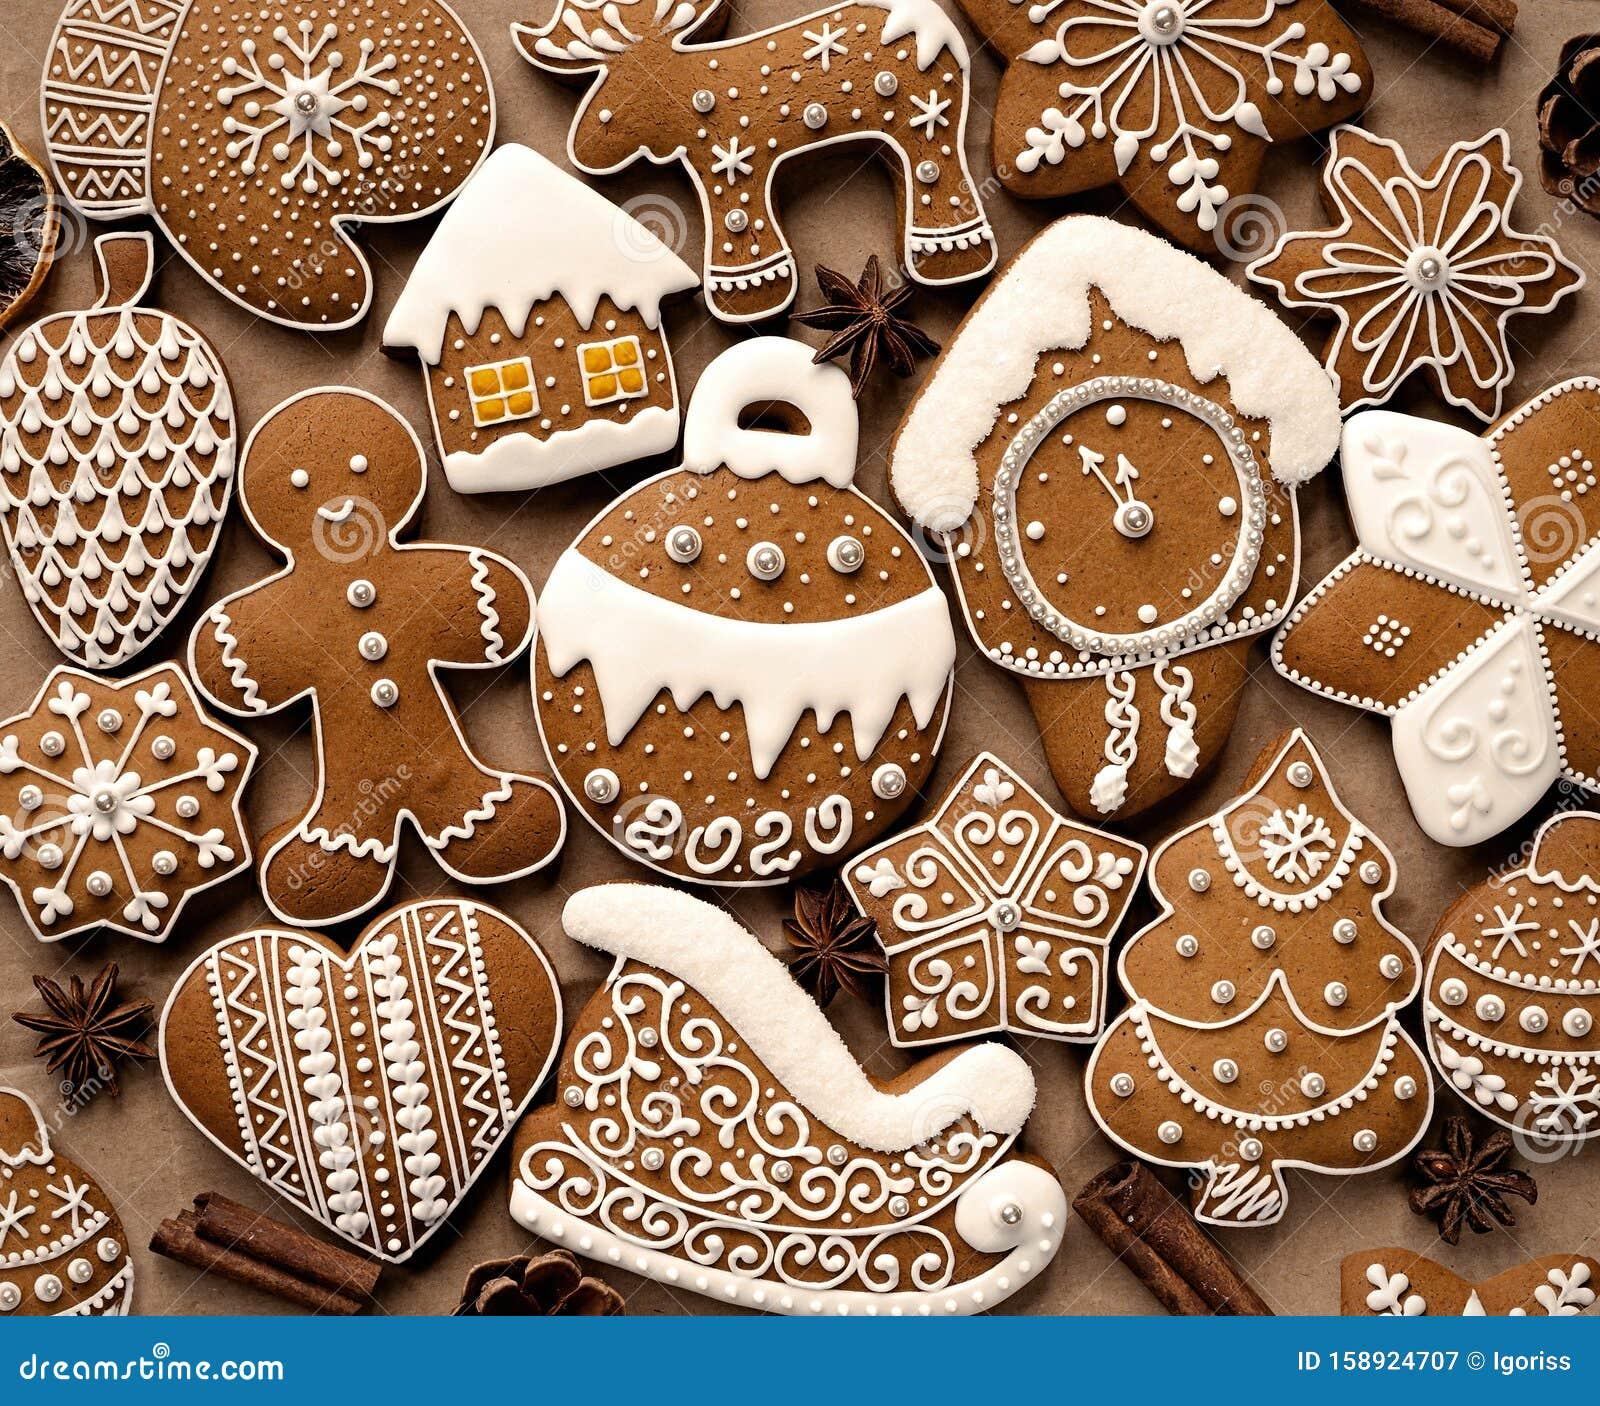 Christmas Cookies December 2020 Homemade Christmas Cookies On Brown Paper Stock Image   Image of